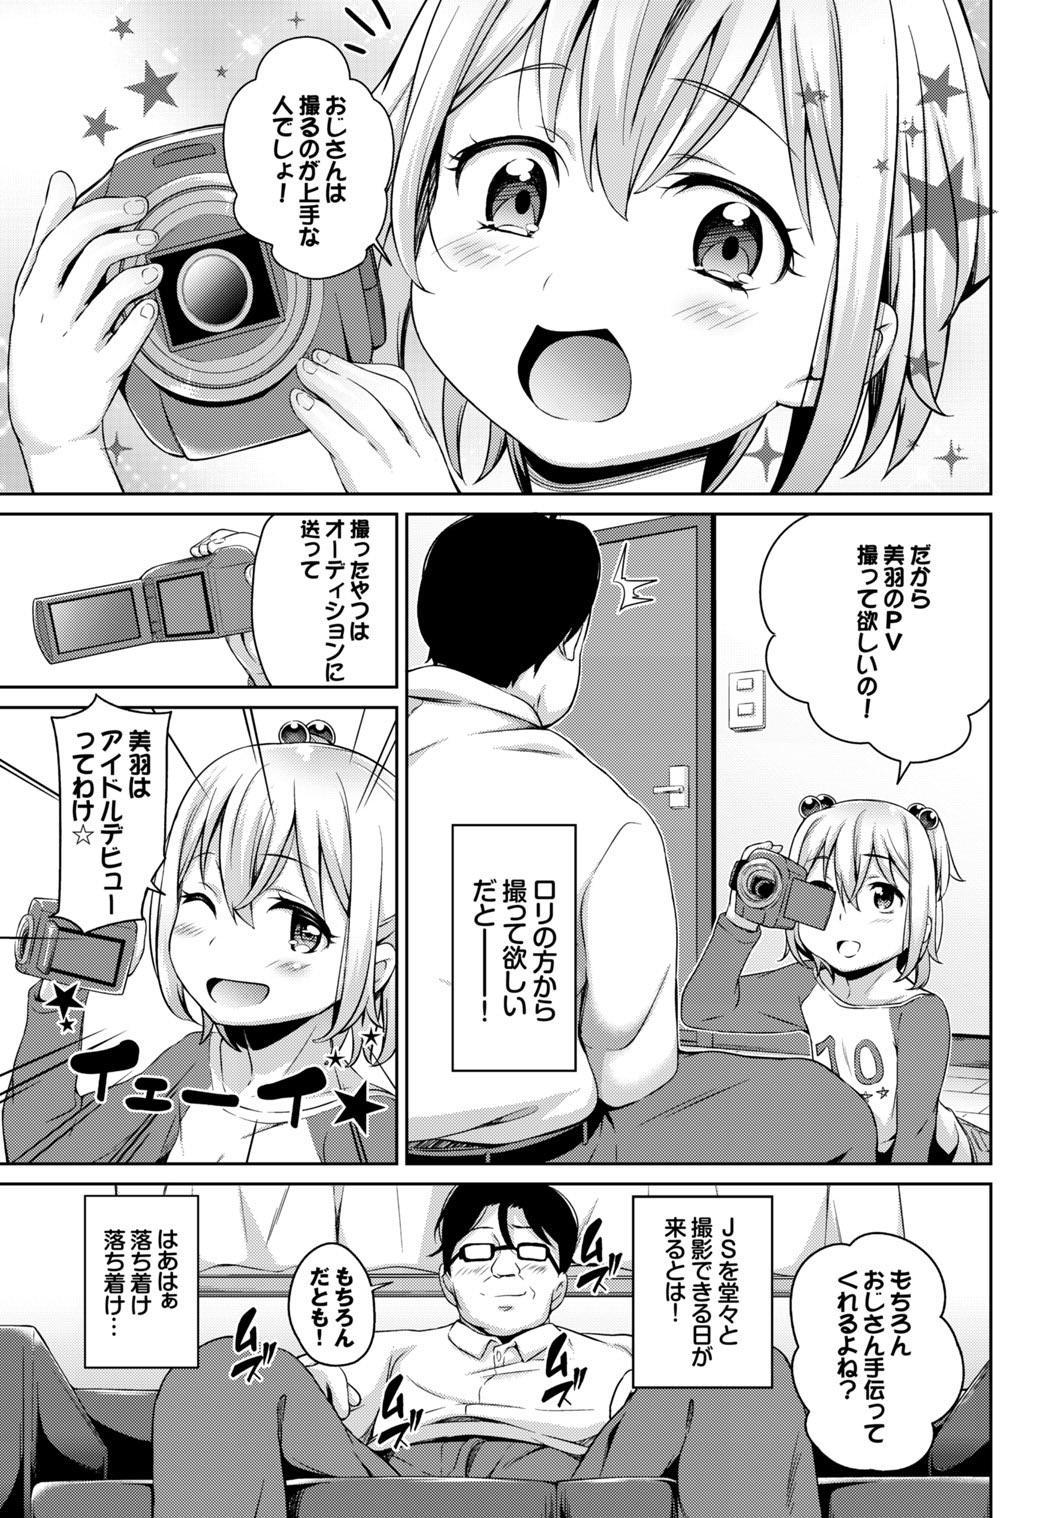 Yappari Mizugi Bishoujo ga Suki Vol. 2 48